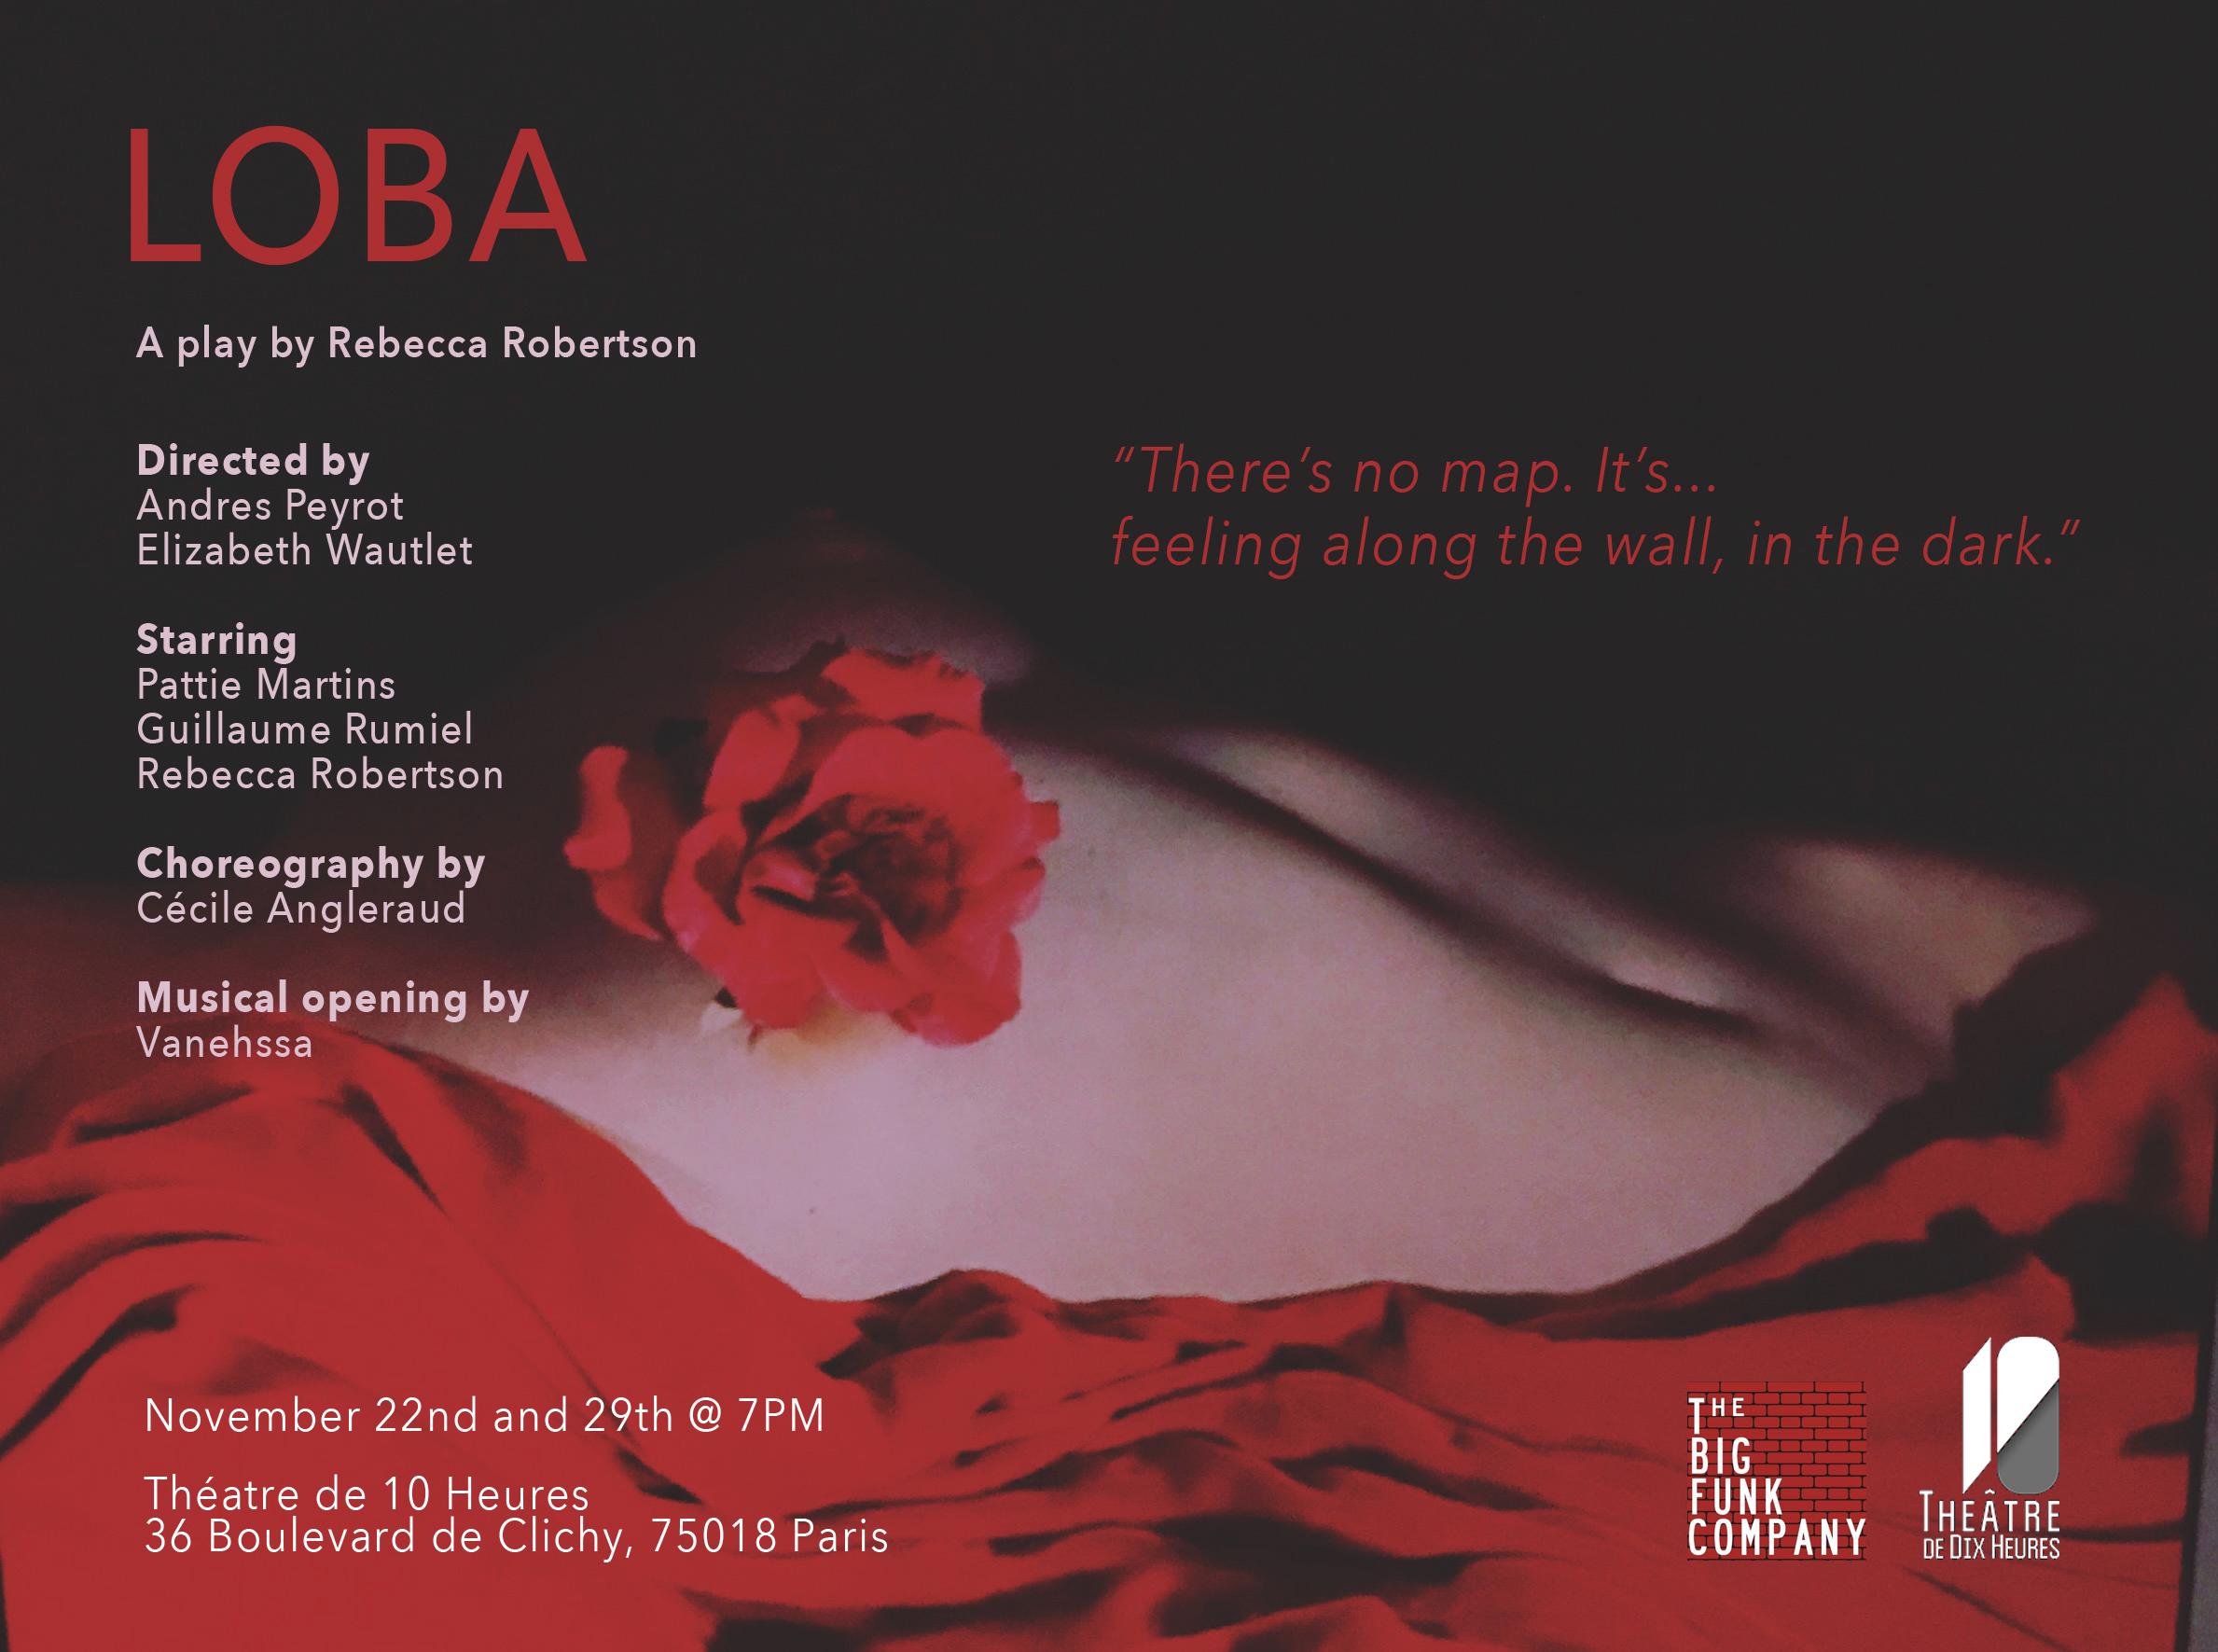 LOBA Poster 1.jpg